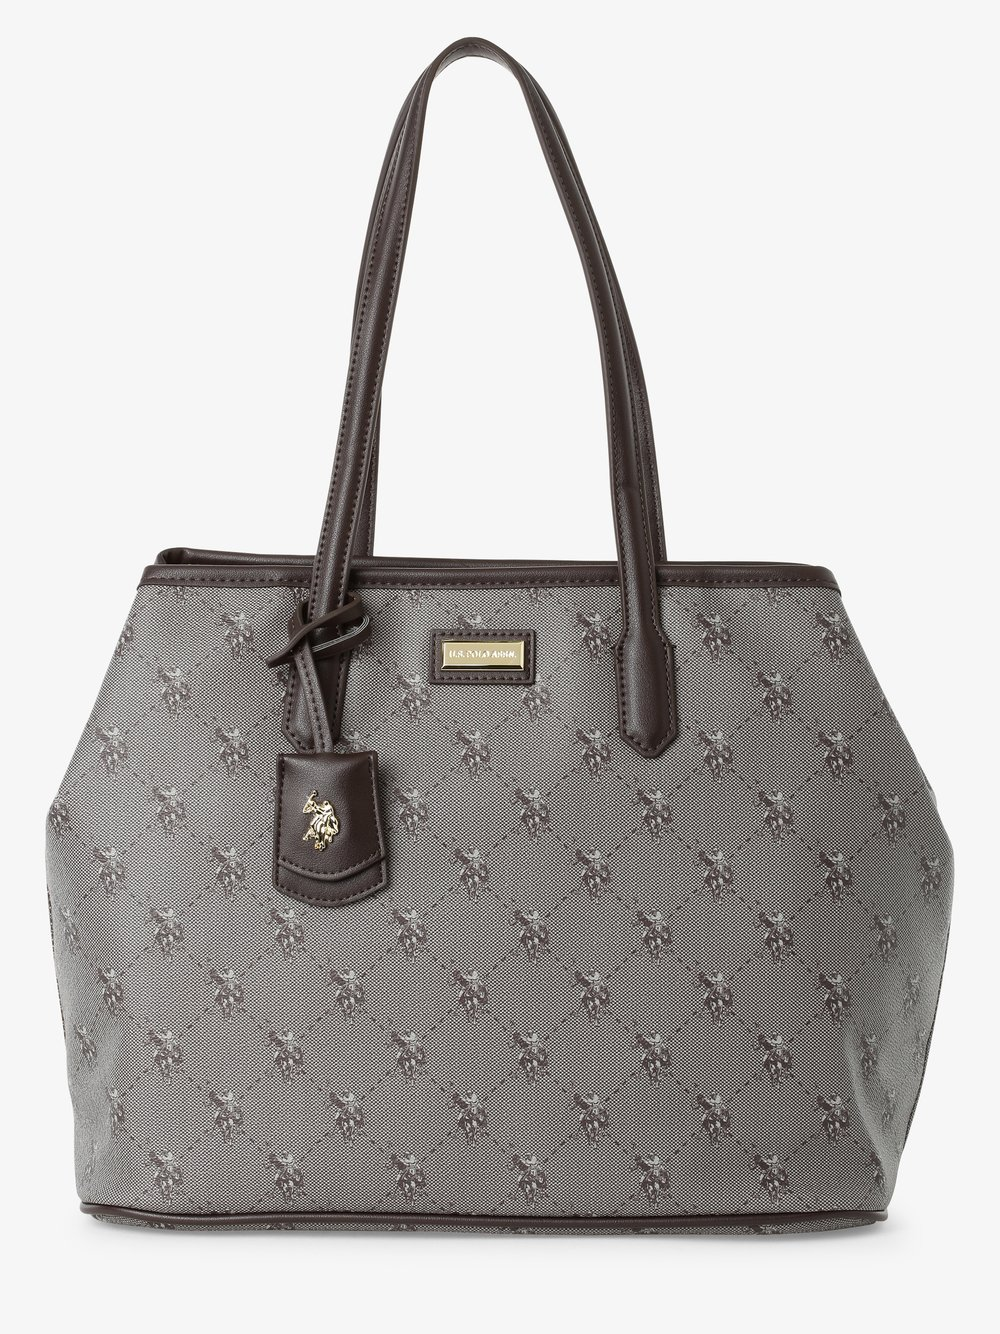 U.S. Polo Assn. – Damska torba shopper – Hampton, brązowy Van Graaf 485198-0002-00000